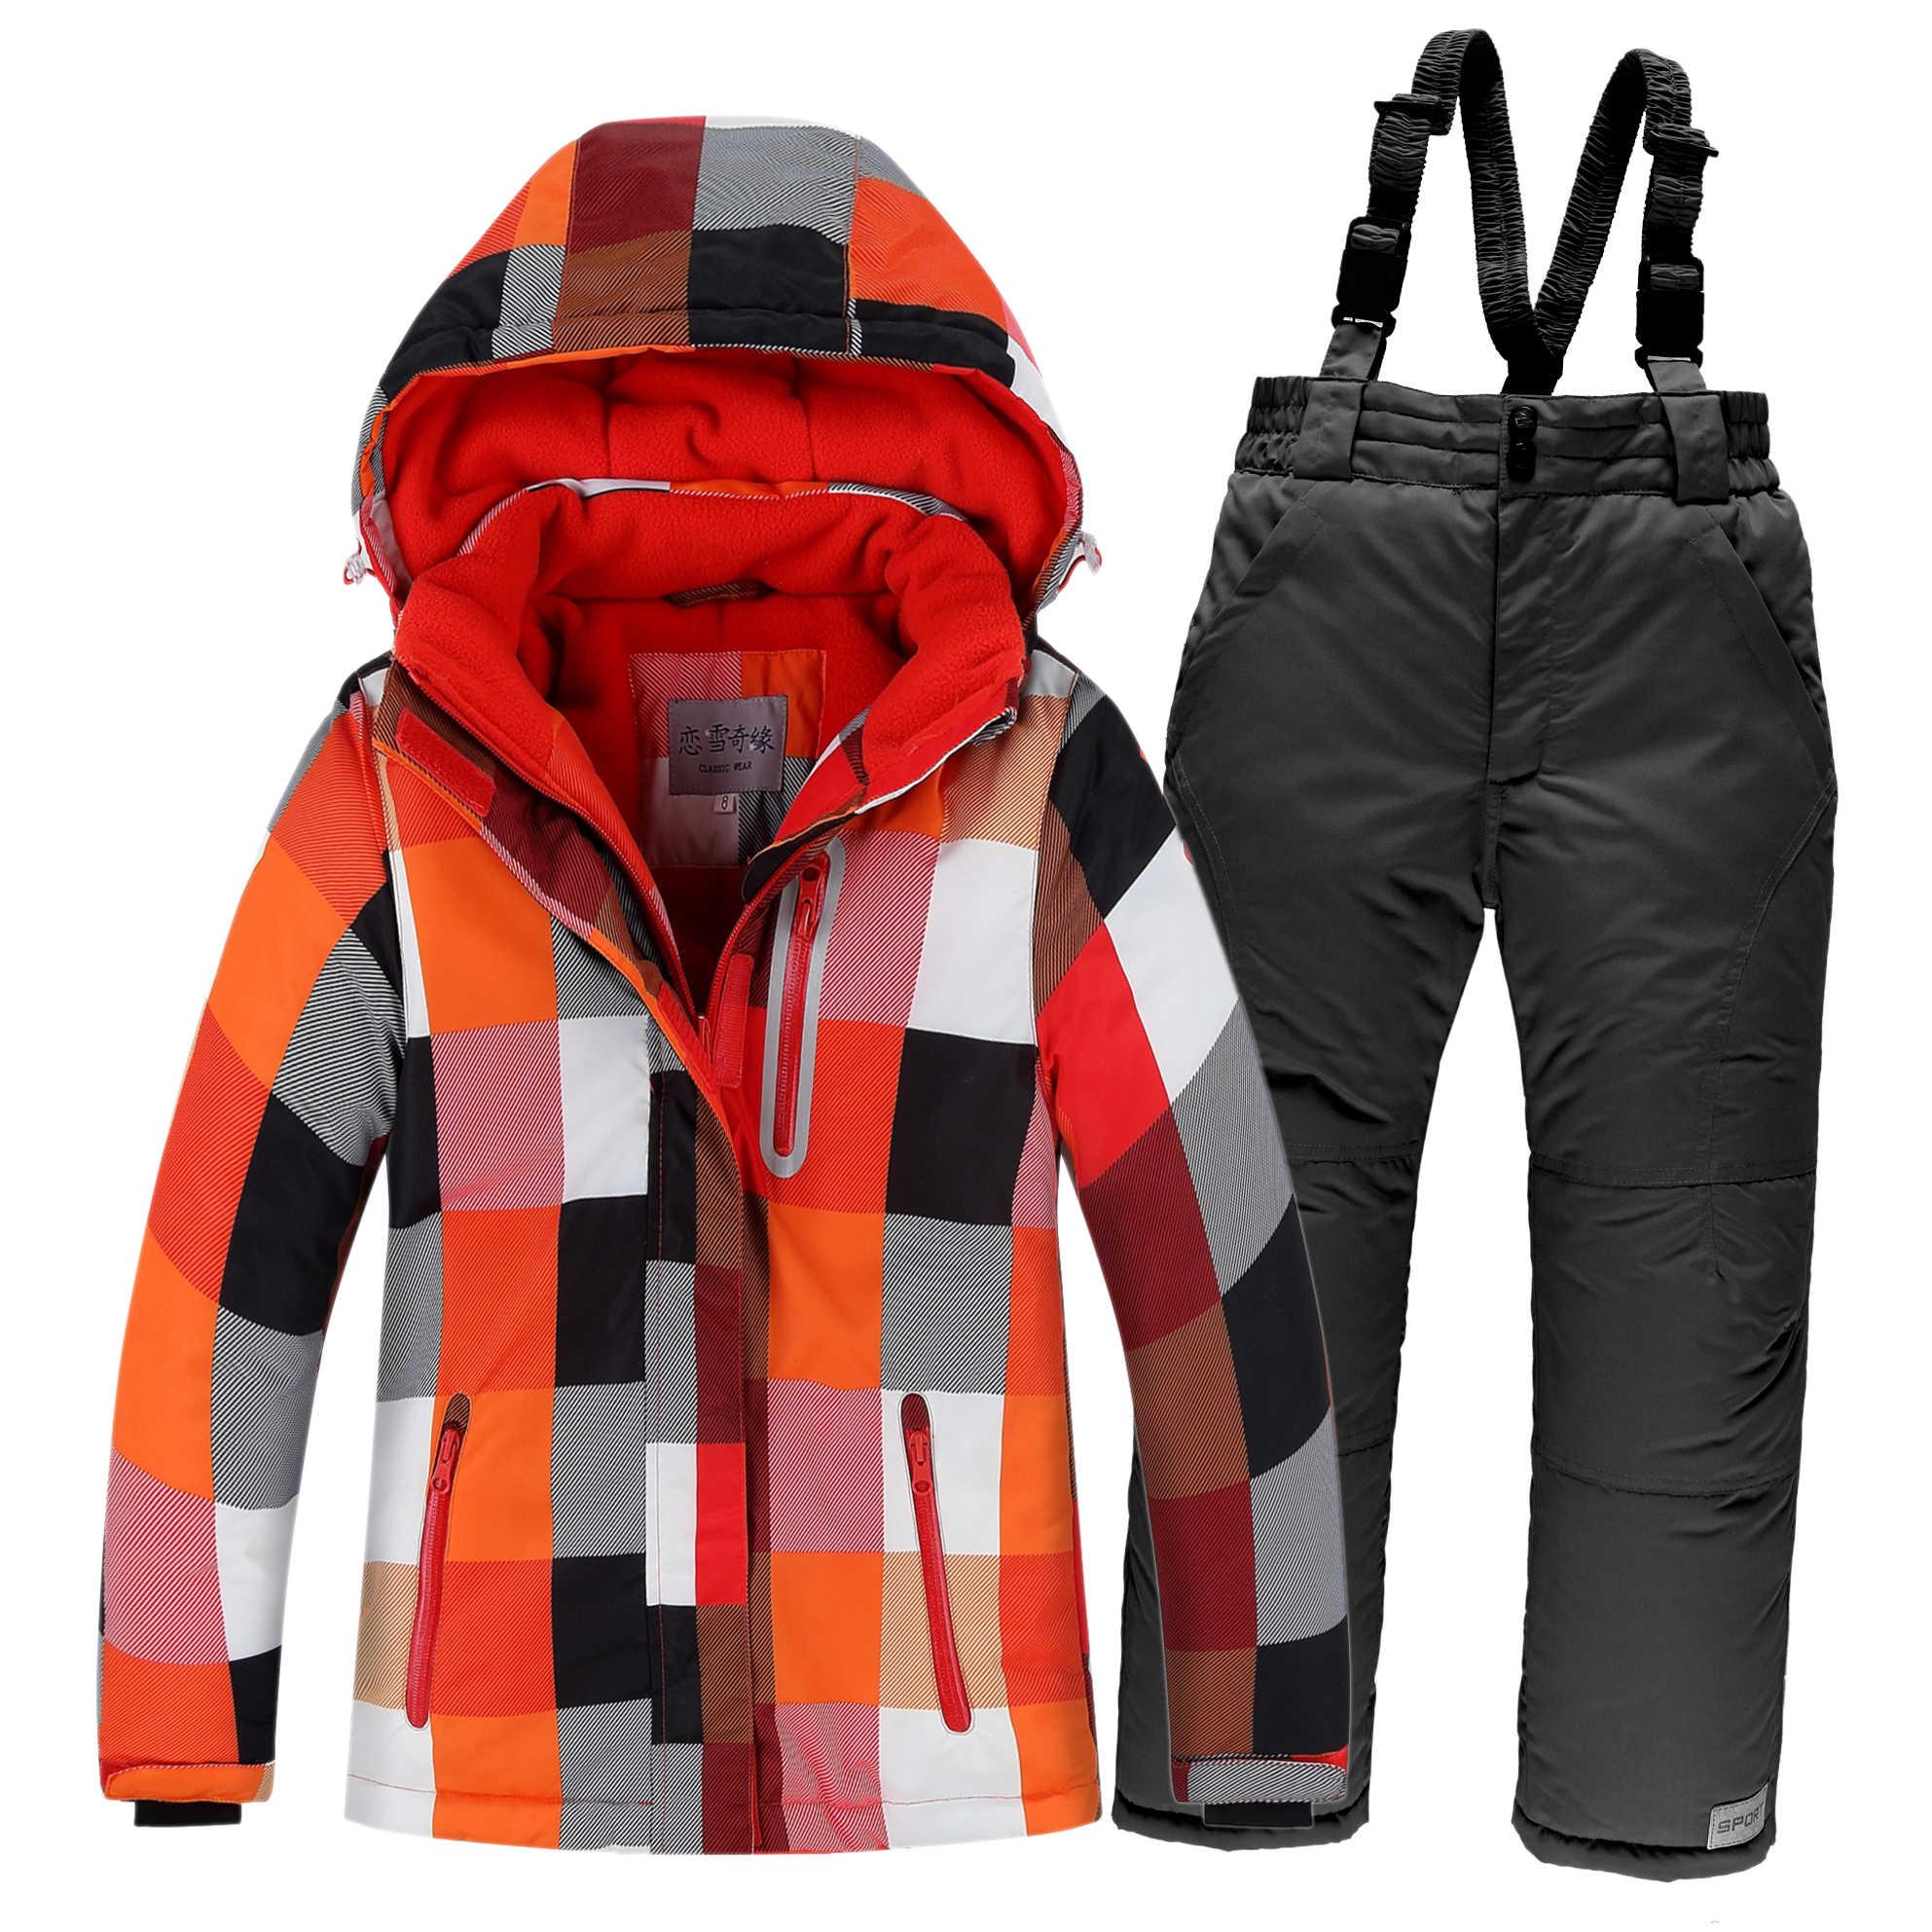 621bdff01c868 OLEKID Winter Children Ski Suit Windproof Warm Girls Clothing Set Jacket +  Overalls Boys Clothes Set